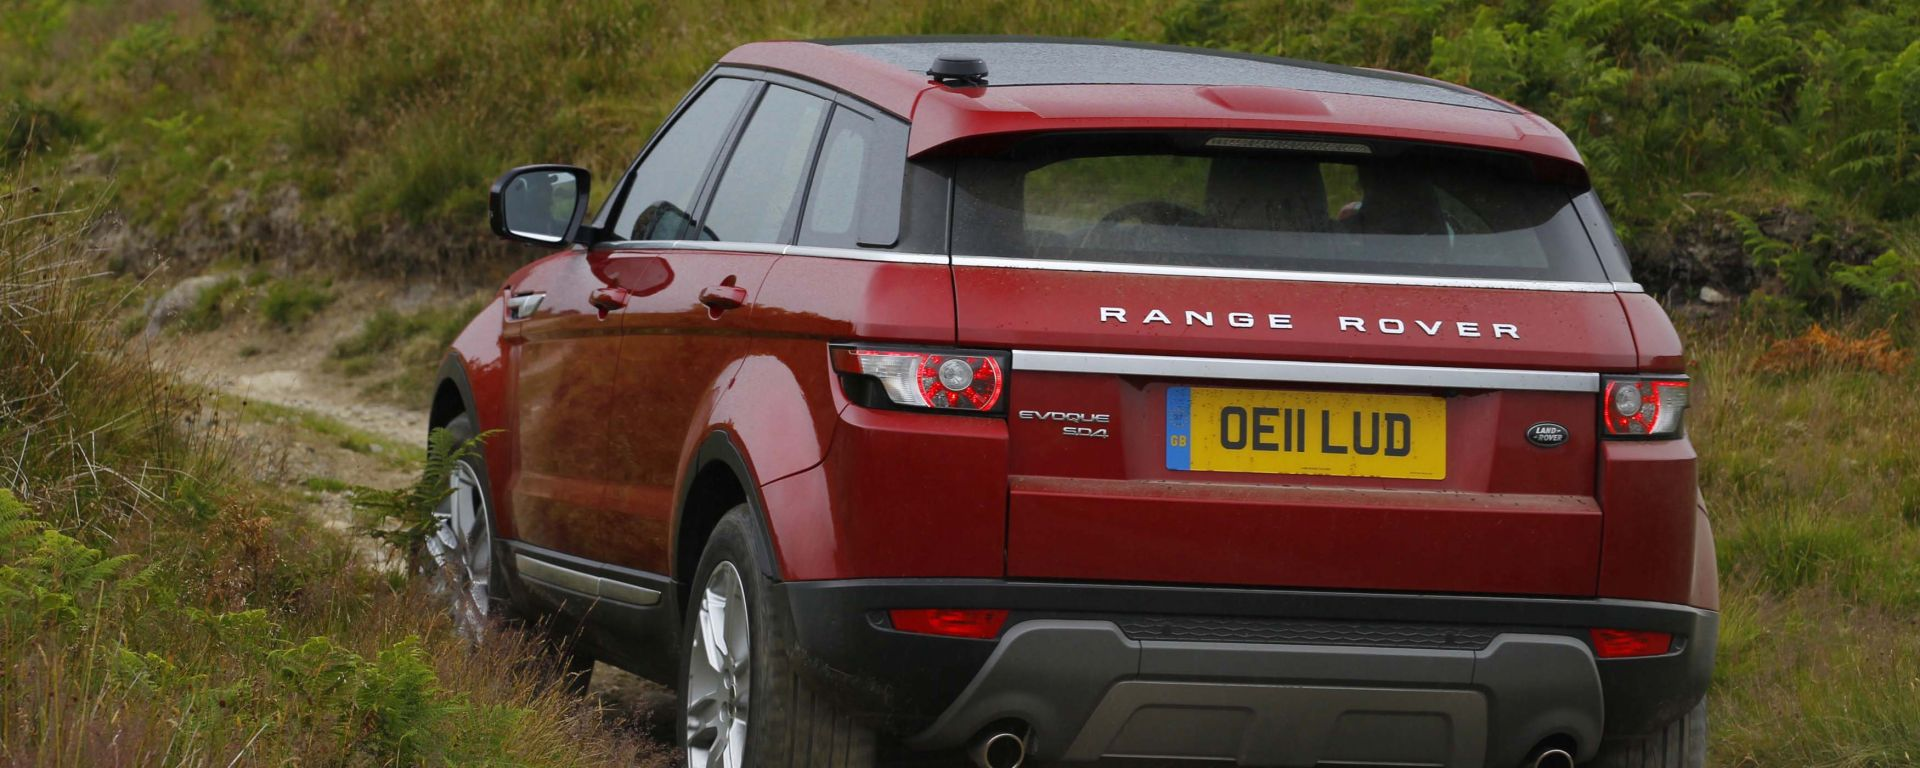 Range Rover Evoque 2.2 Prestige SD4 Aut.